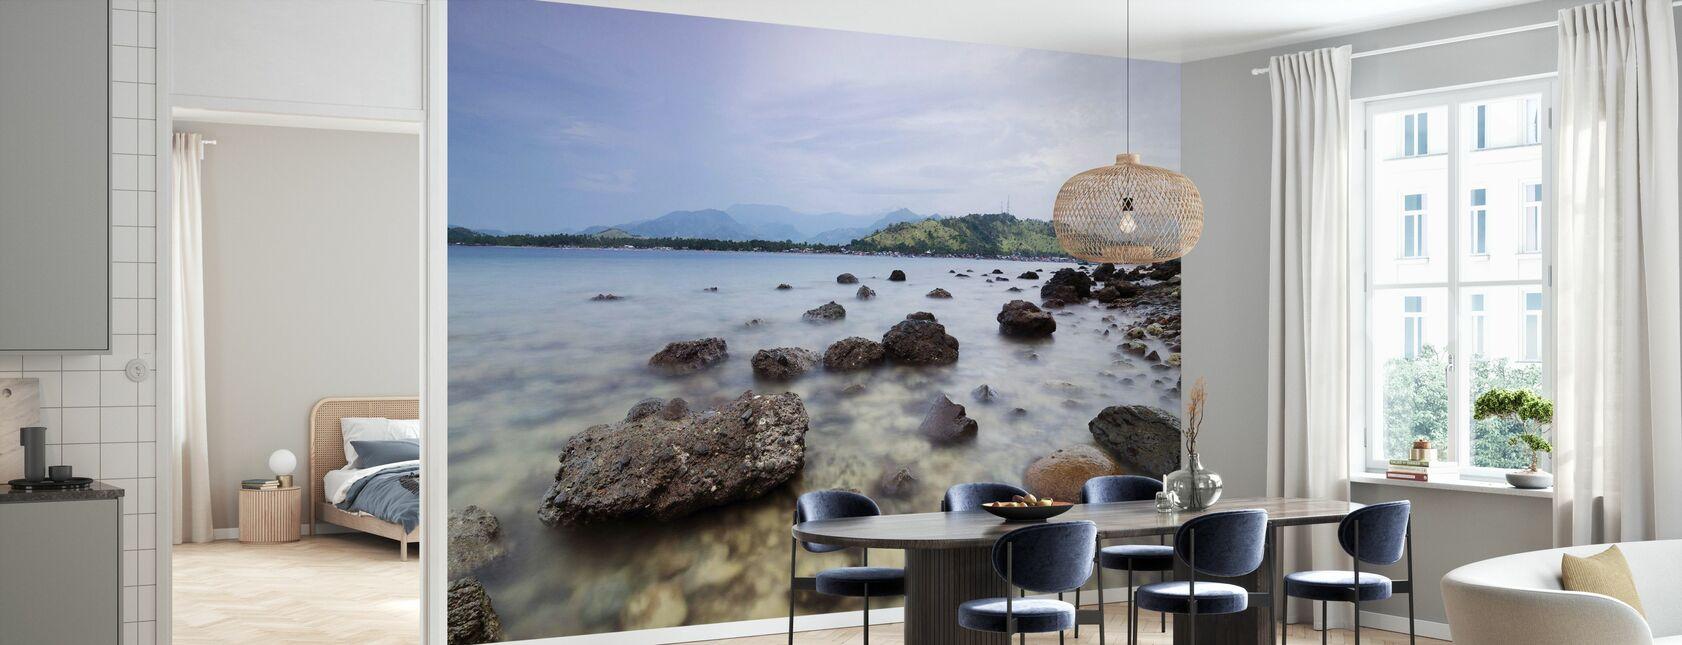 Rocks in Tibanban Island - Wallpaper - Kitchen